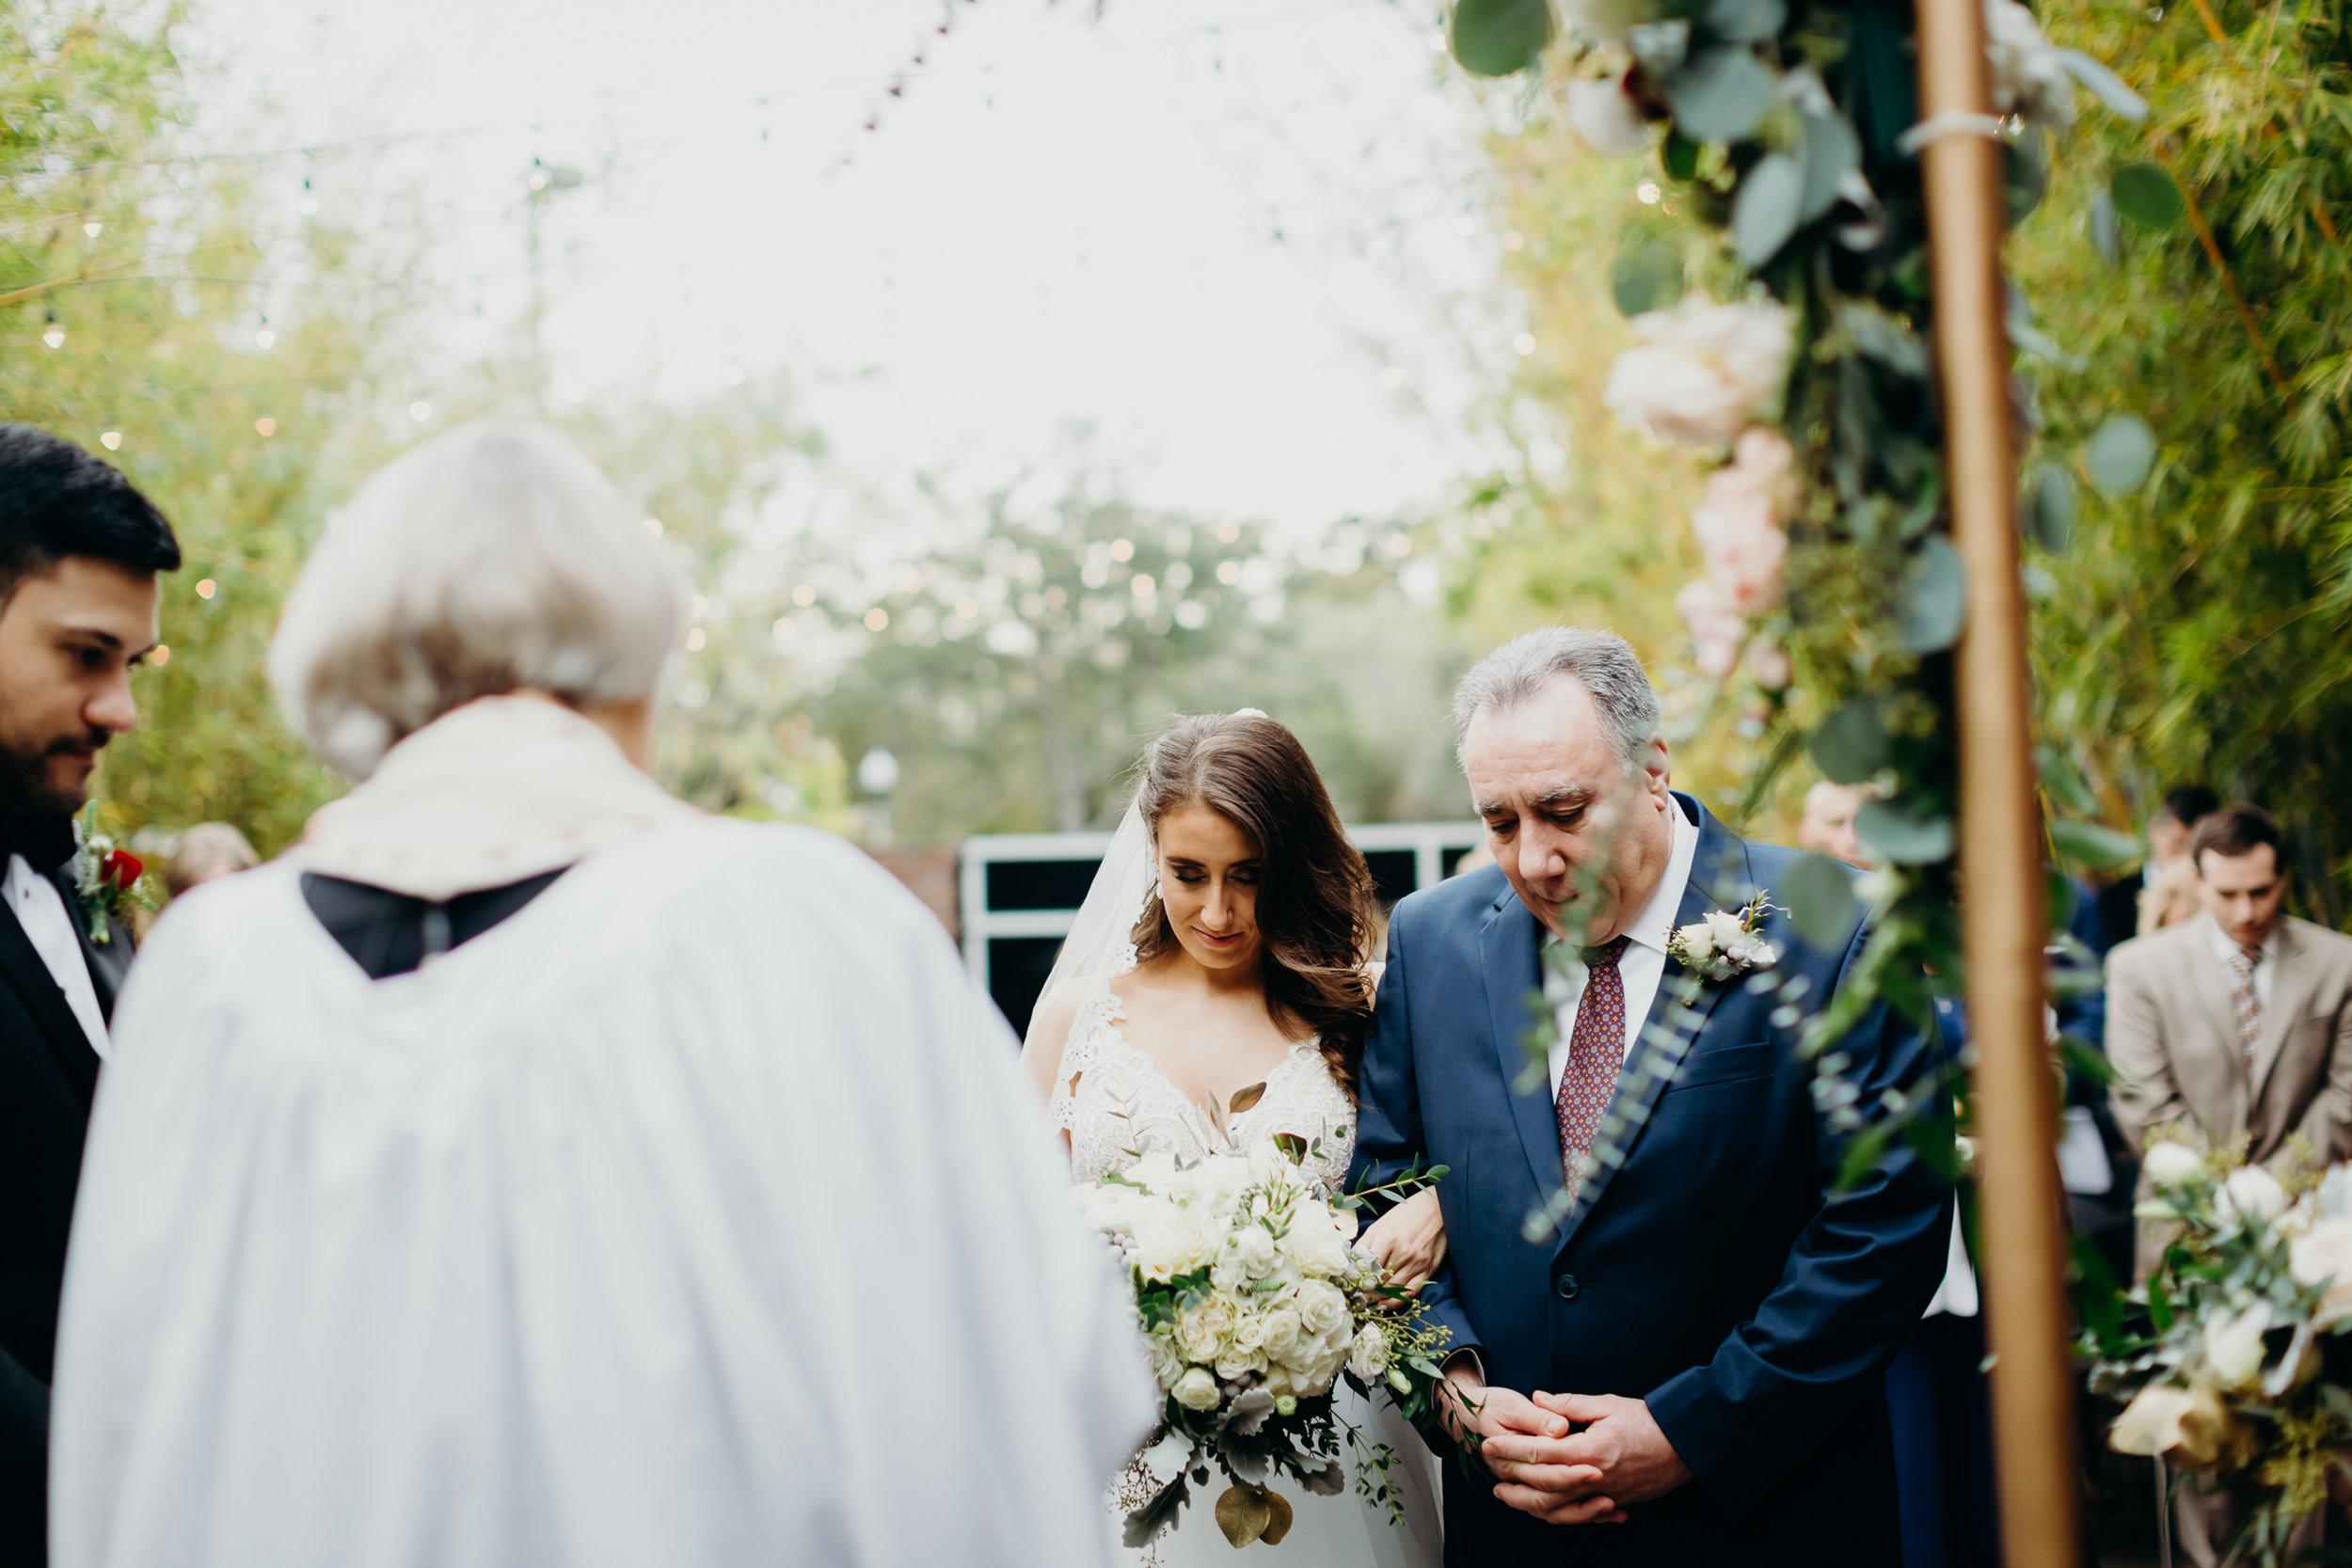 Gianna Keiko Atlanta San Francisco NYC Wedding Engagement Wedding Elopement Photographer_Sneak Peek-31.jpg